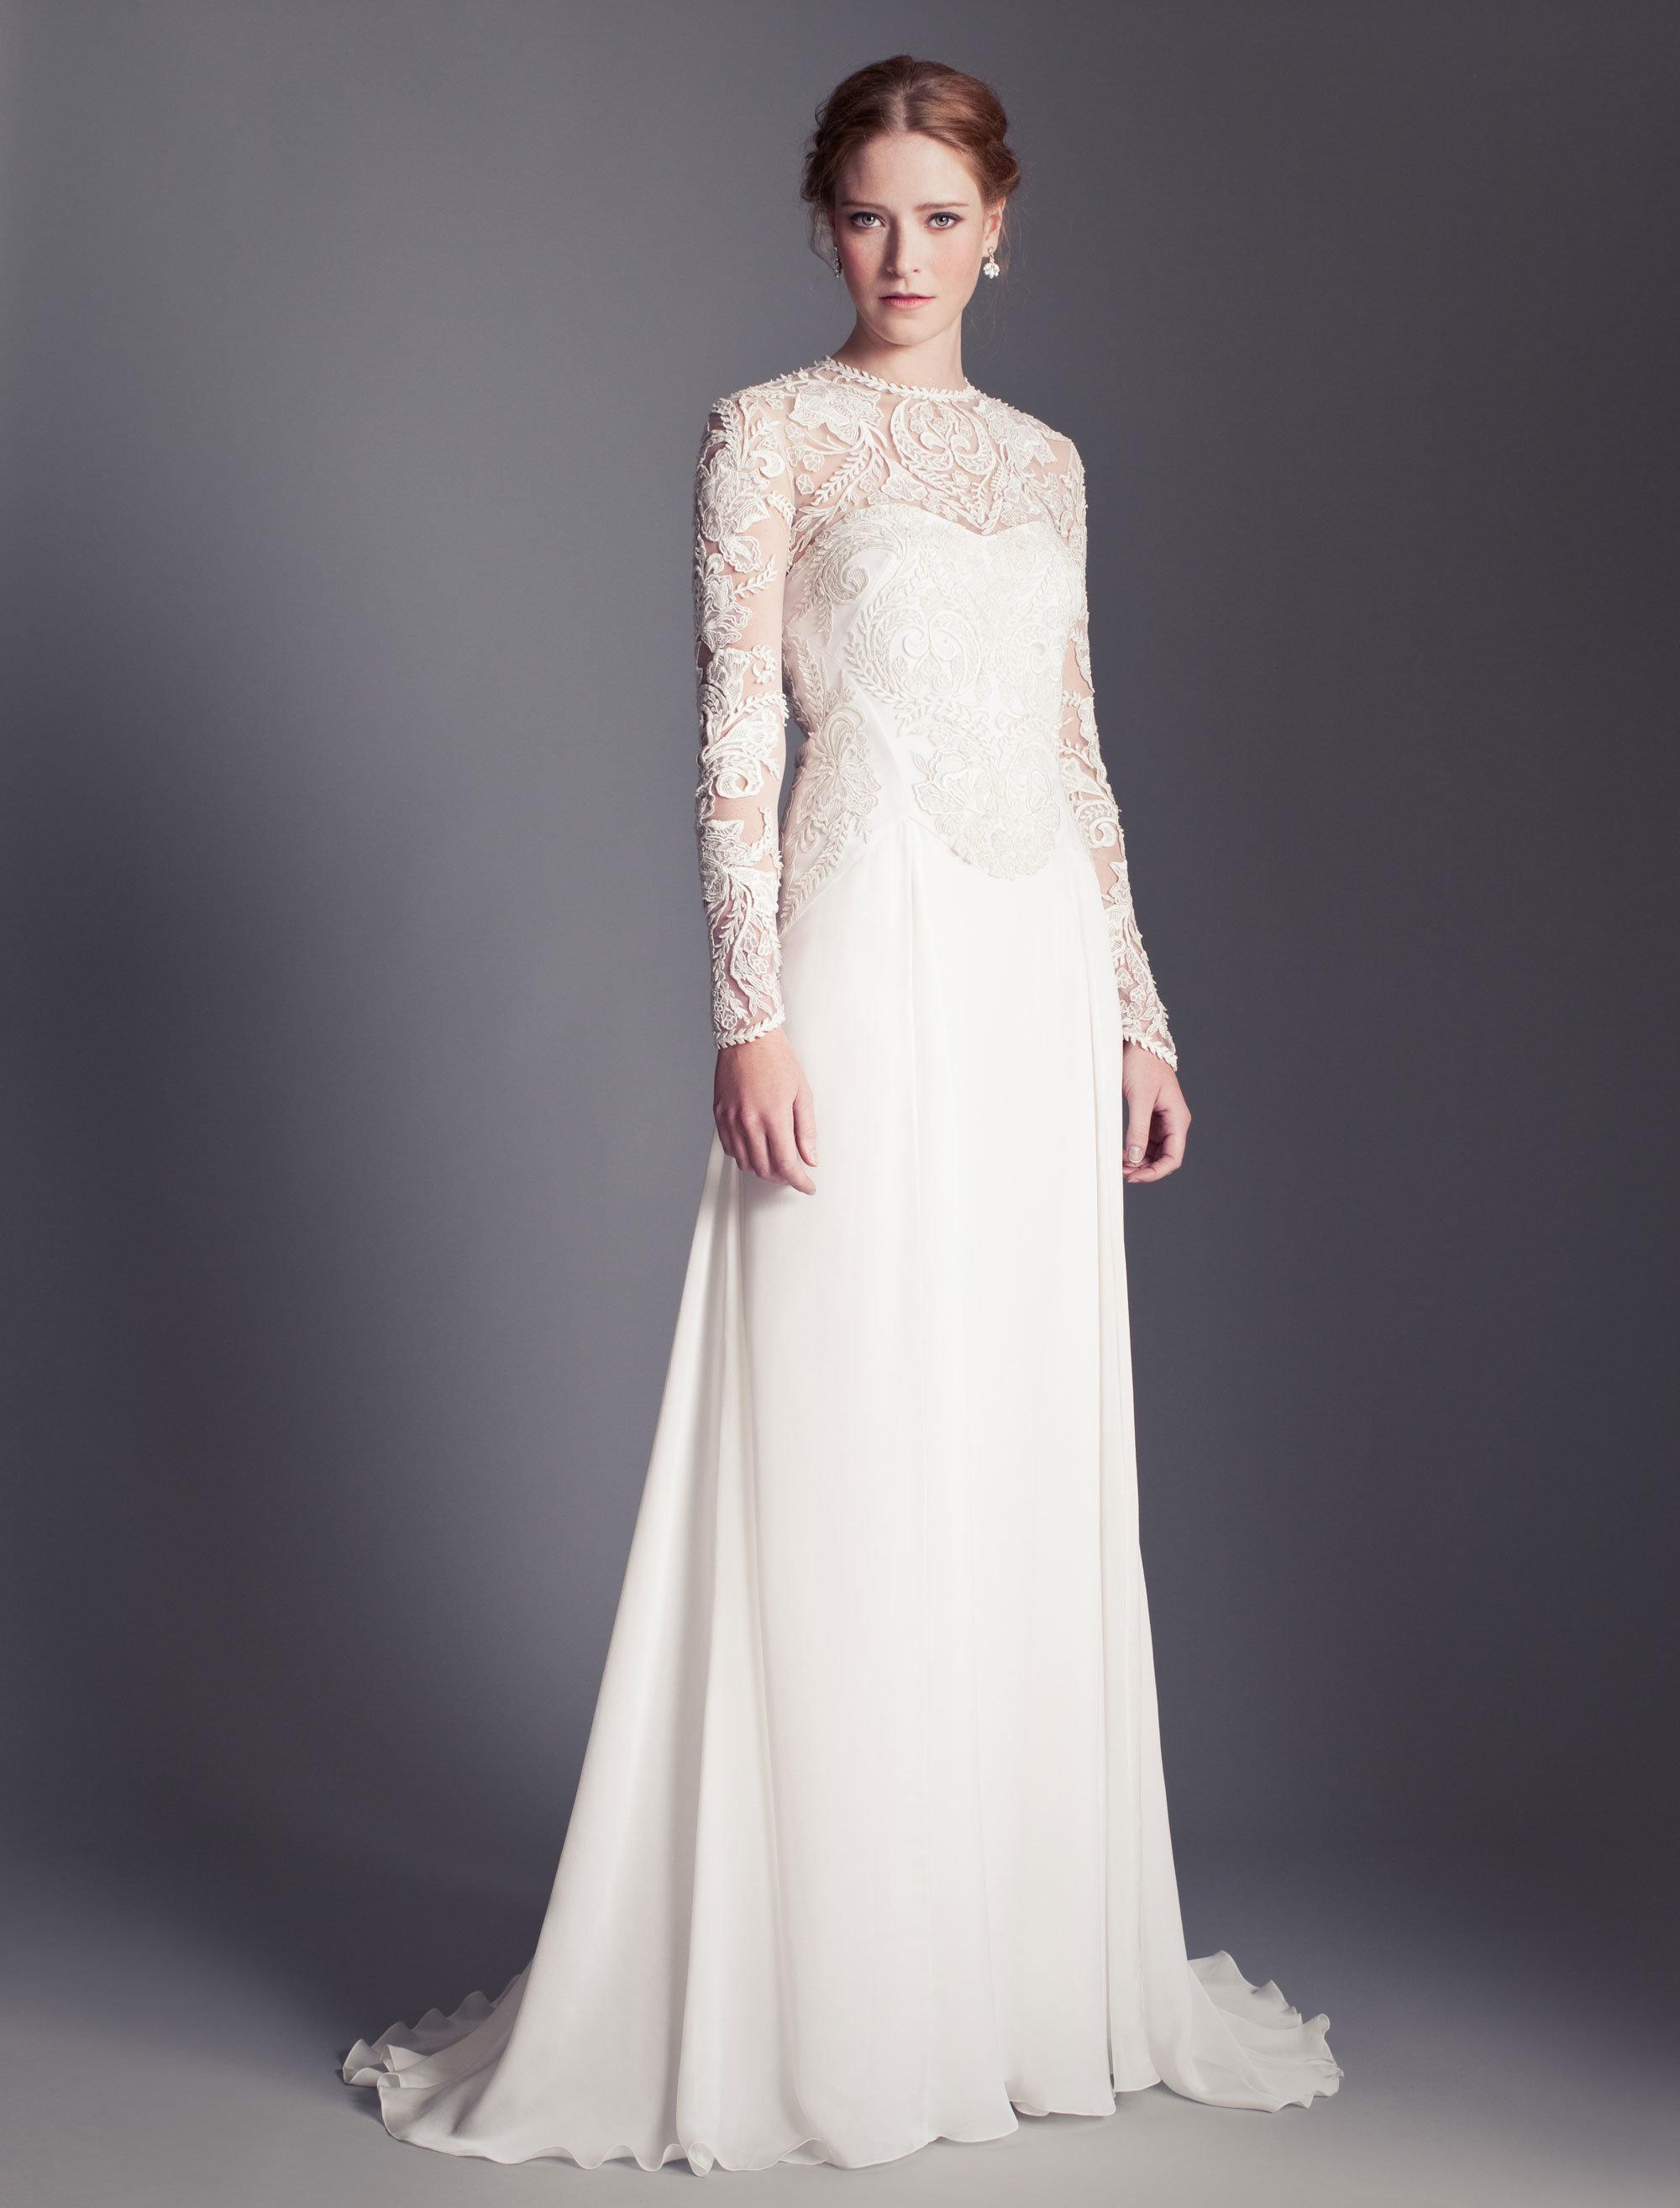 Downton Abbey Wedding Dresses